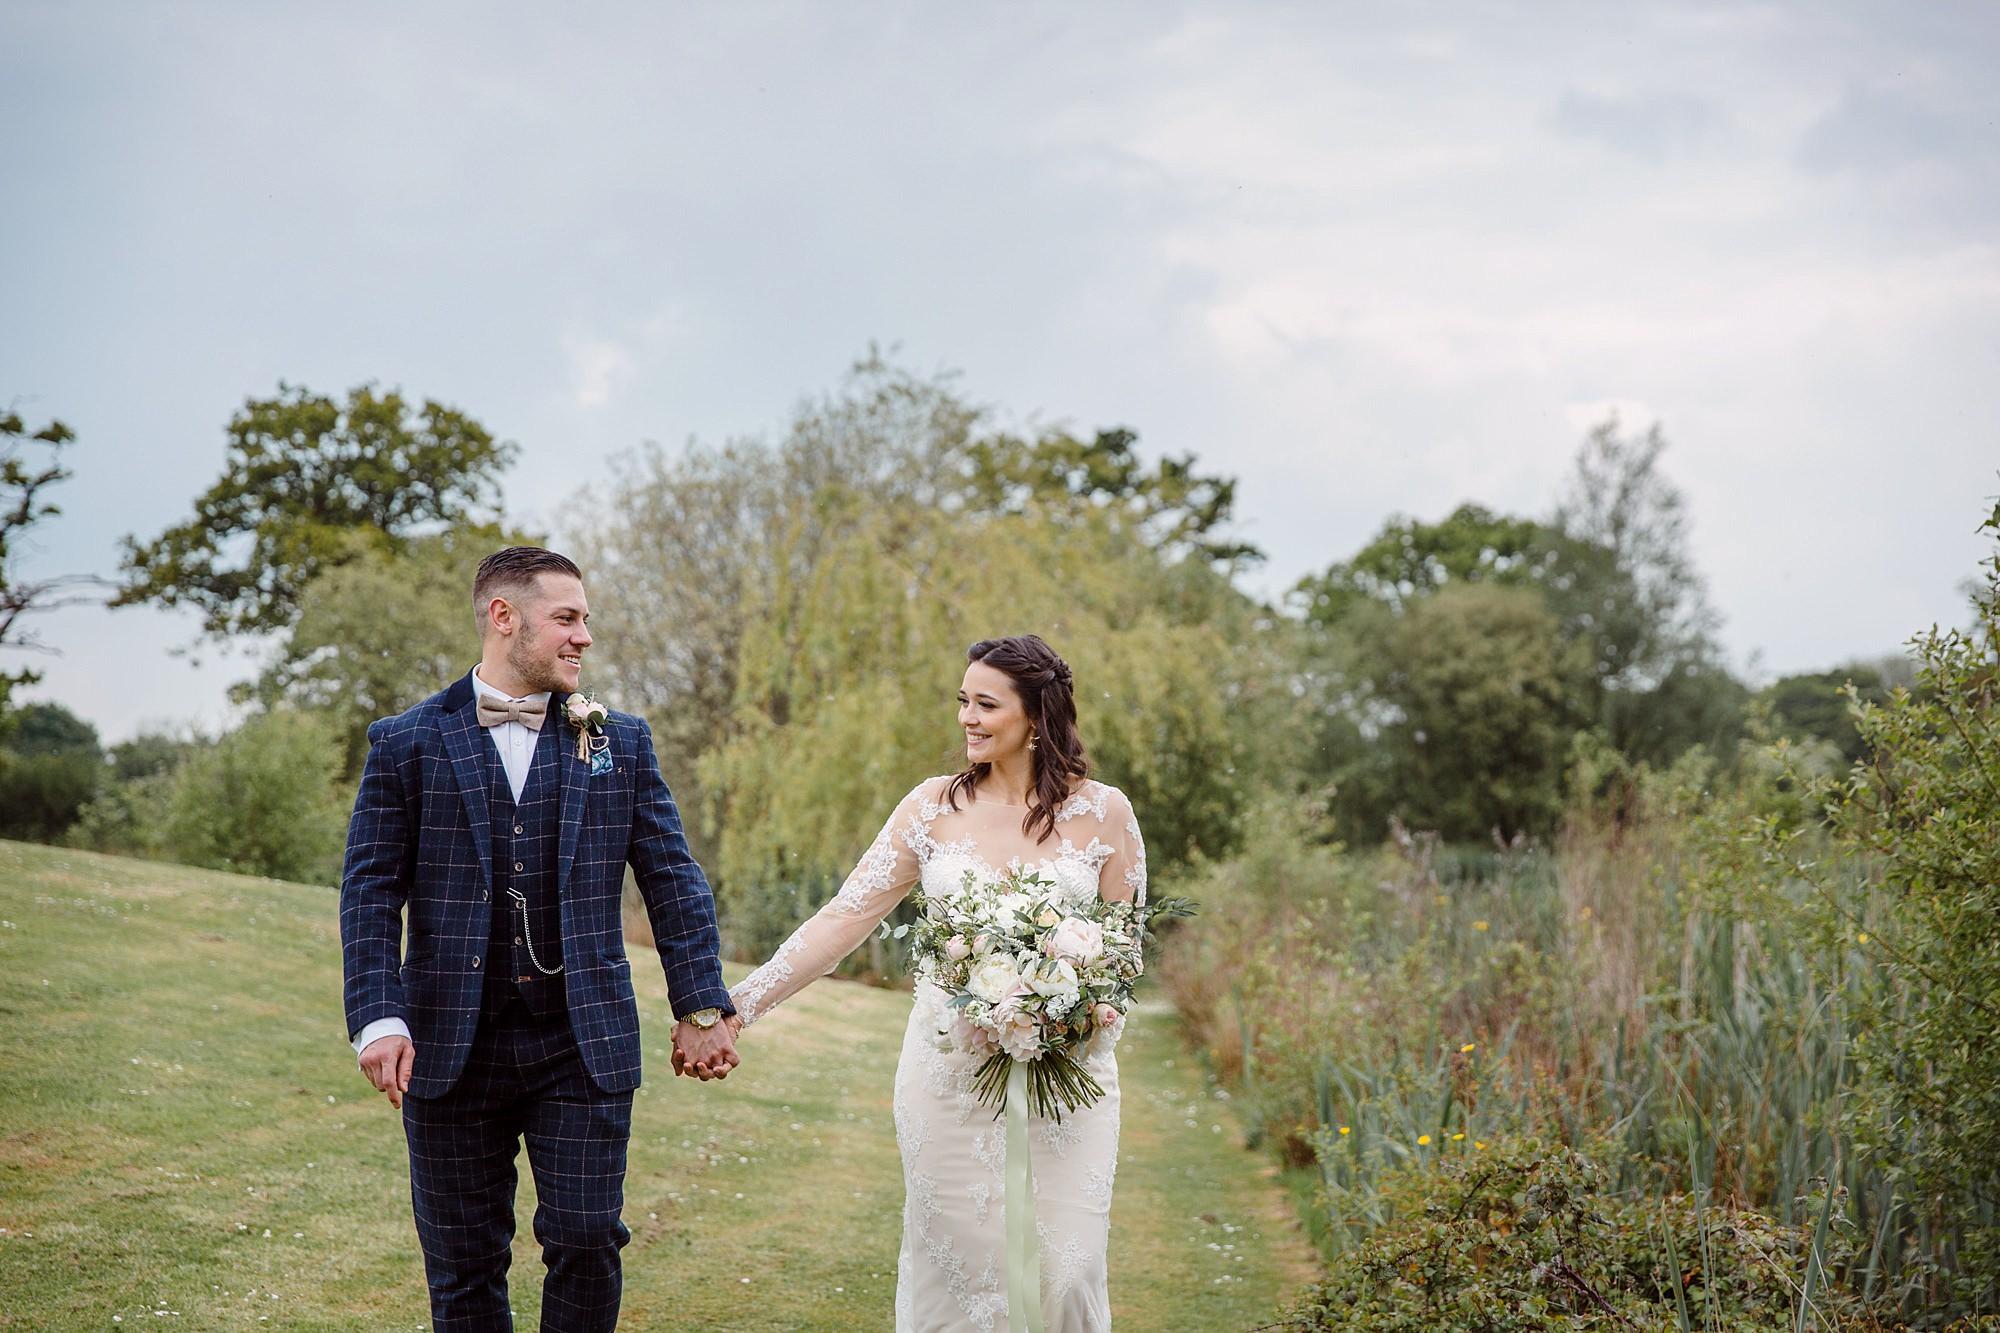 humanist wedding old greens barn bride and groom walking together